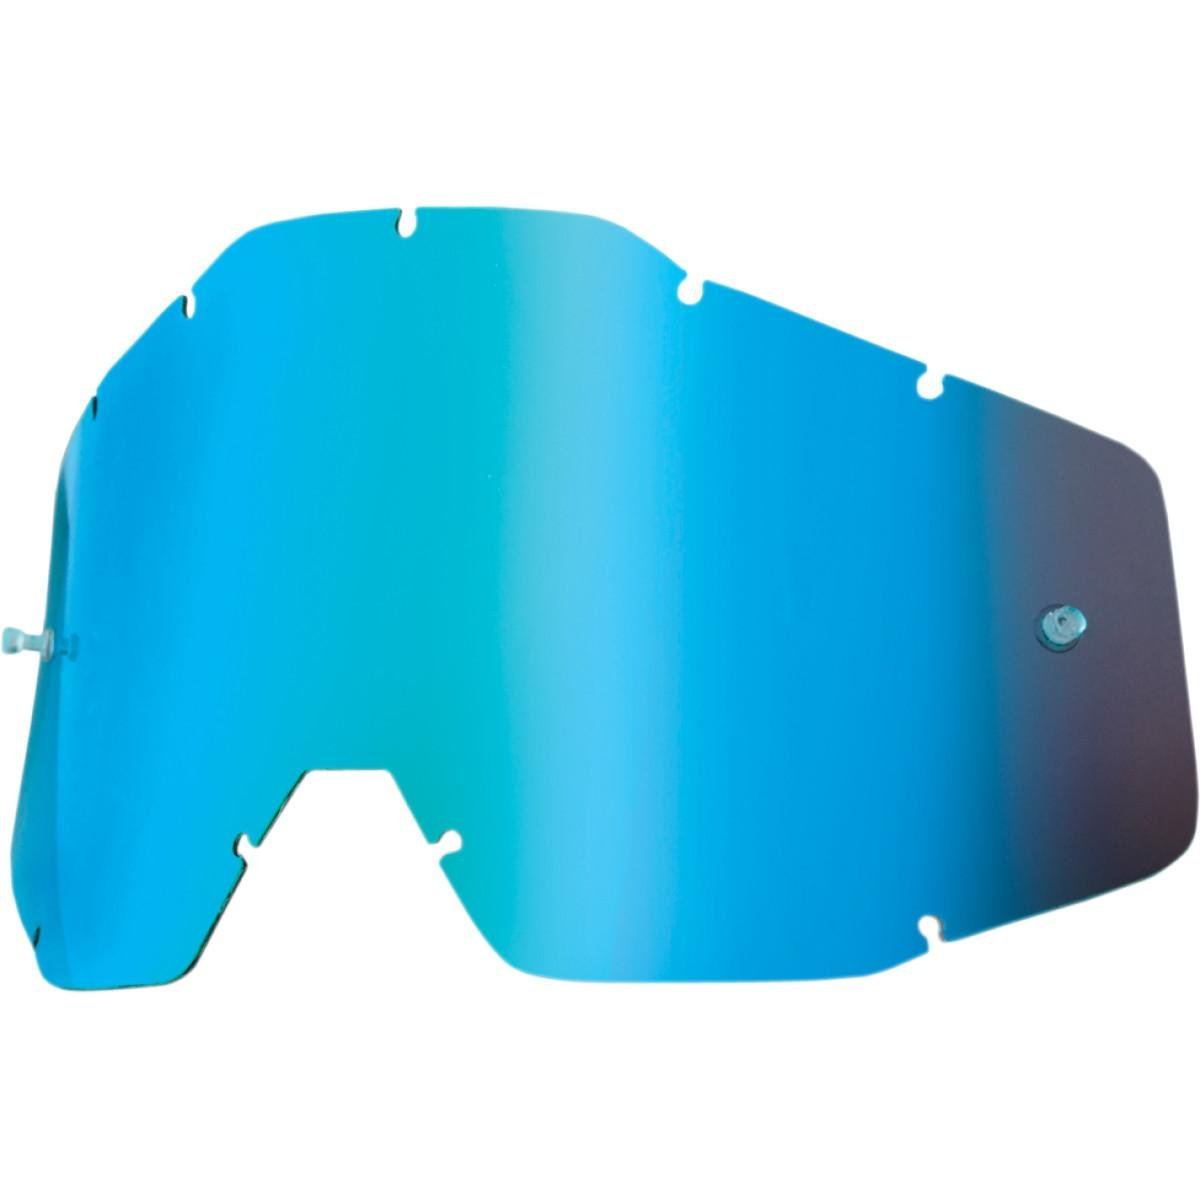 100/% Racecraft Adult Replacement Lens MotoX Motorcycle Eyewear Accessories One Size Blue Mirror//Smoke Anti-Fog